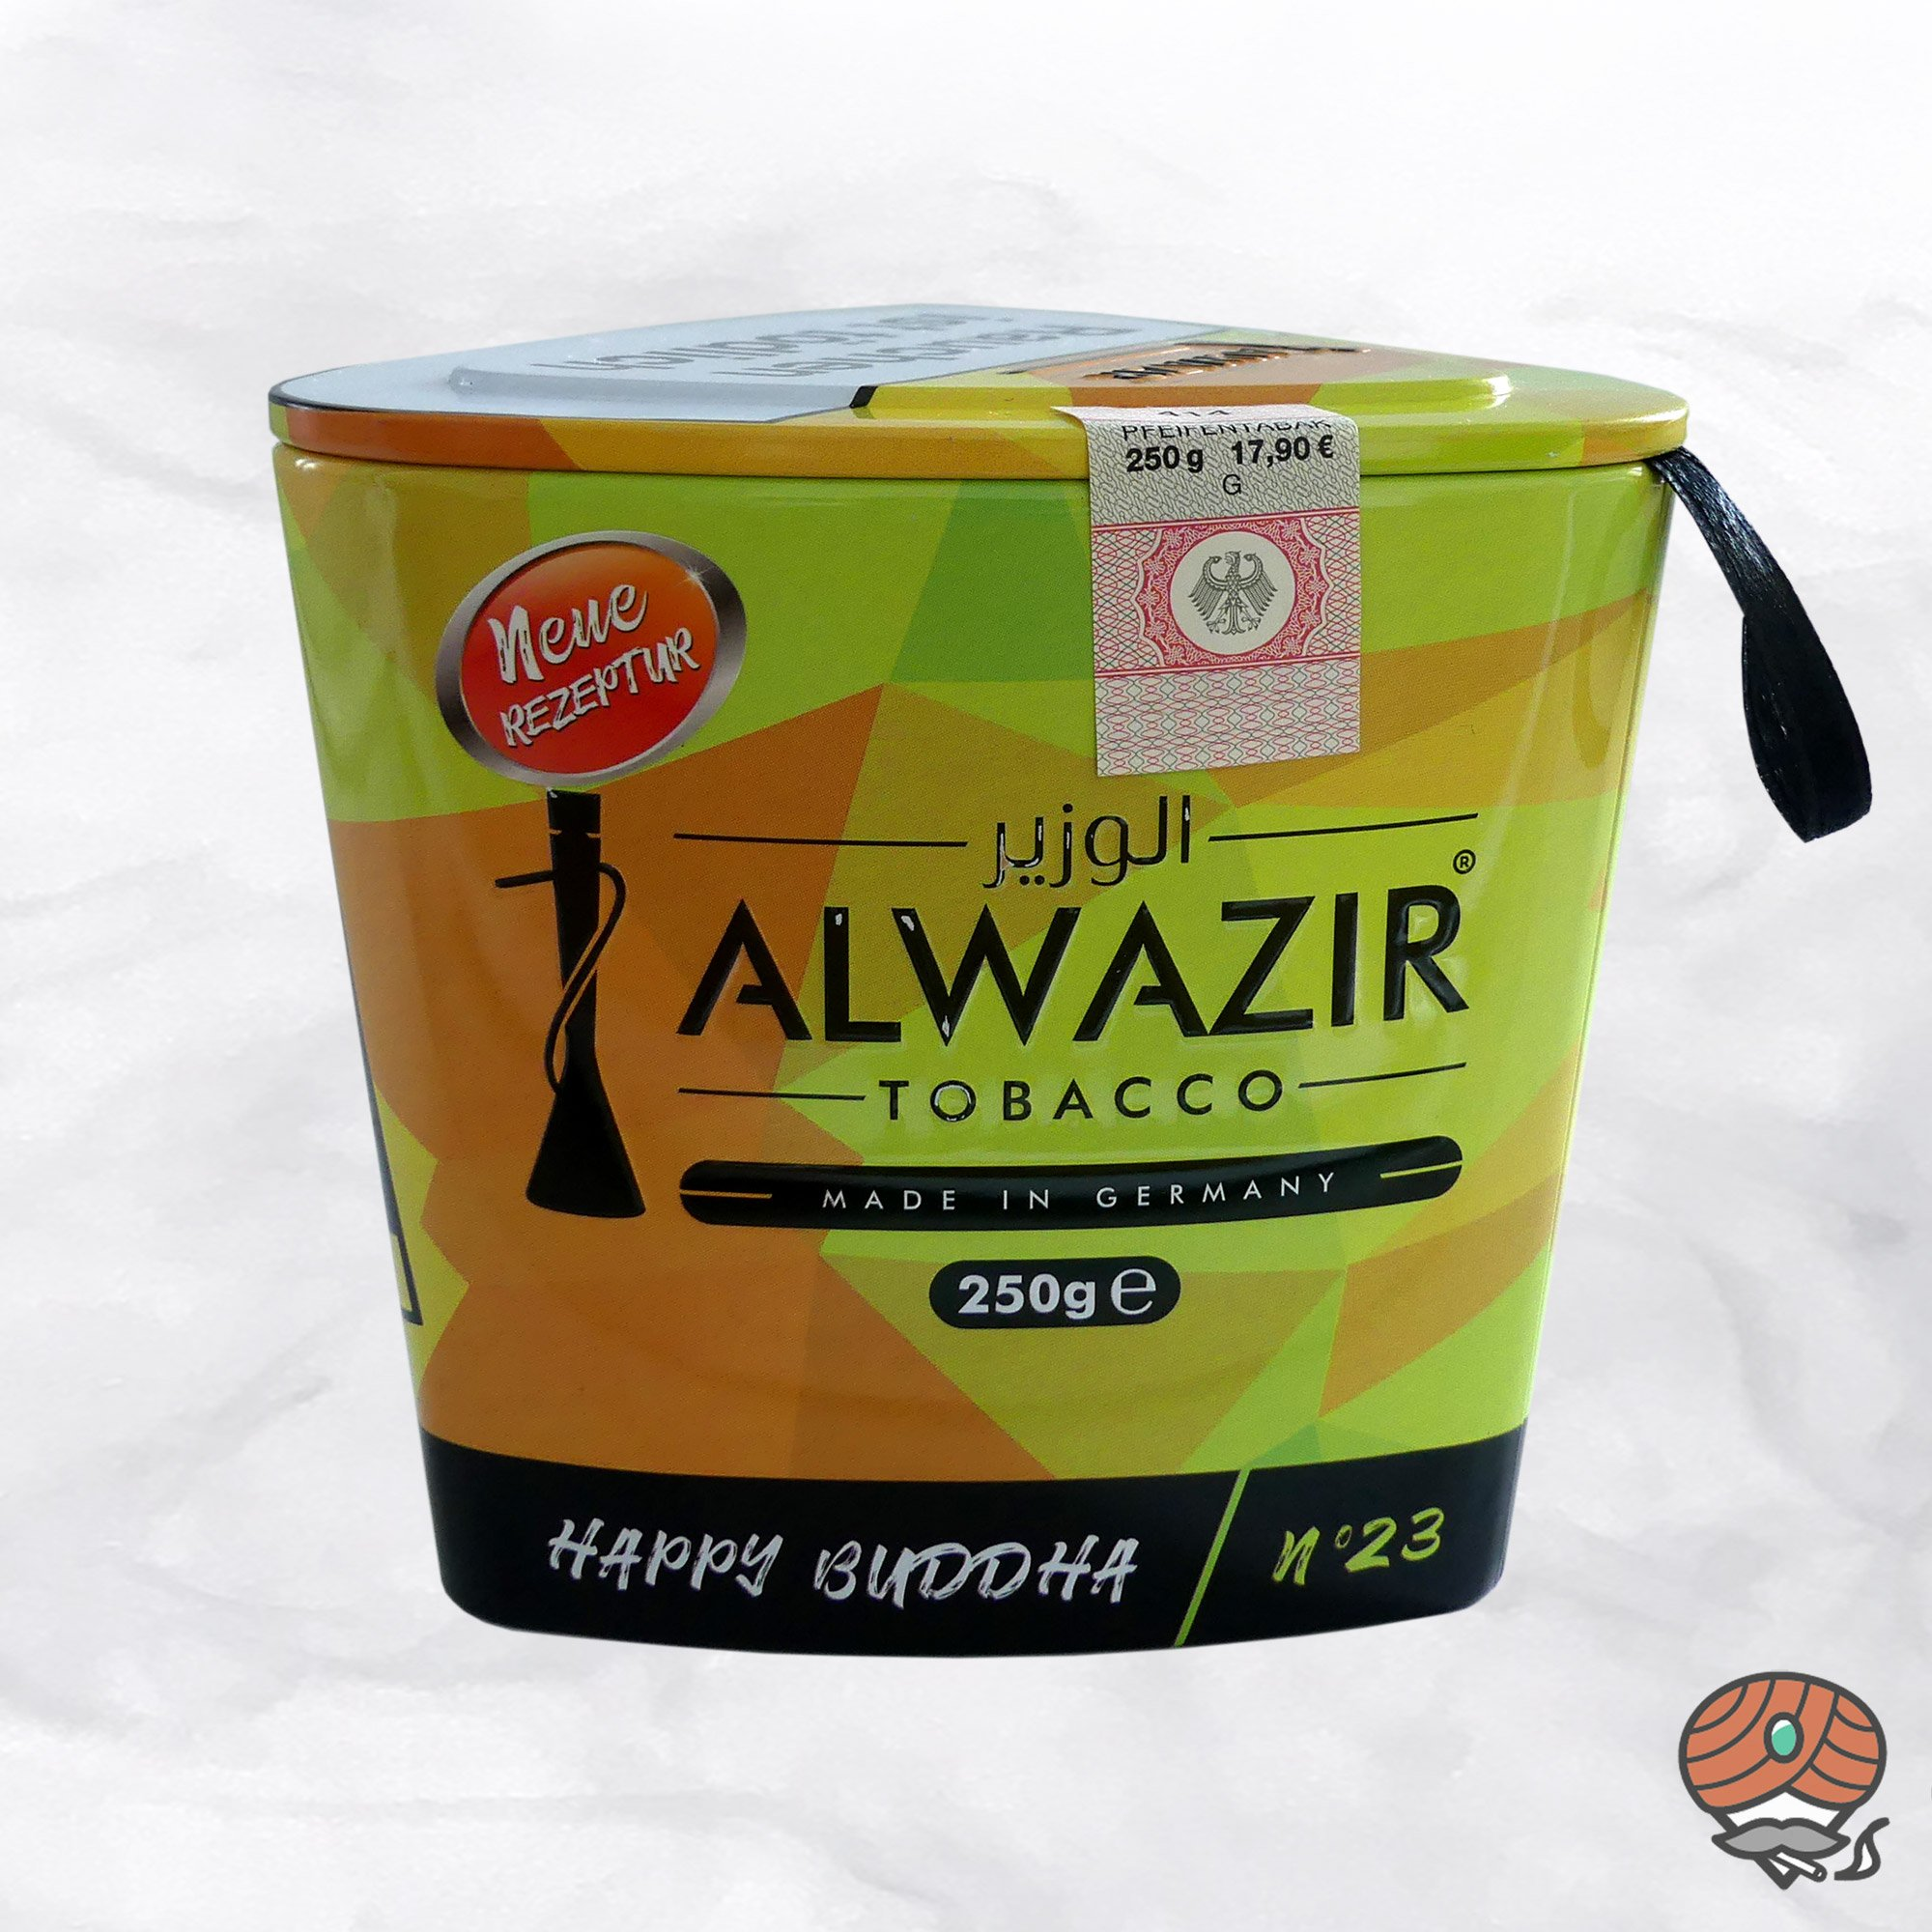 Alwazir Shisha Tabak - No. 23 - HAPPY BUDDHA 250g